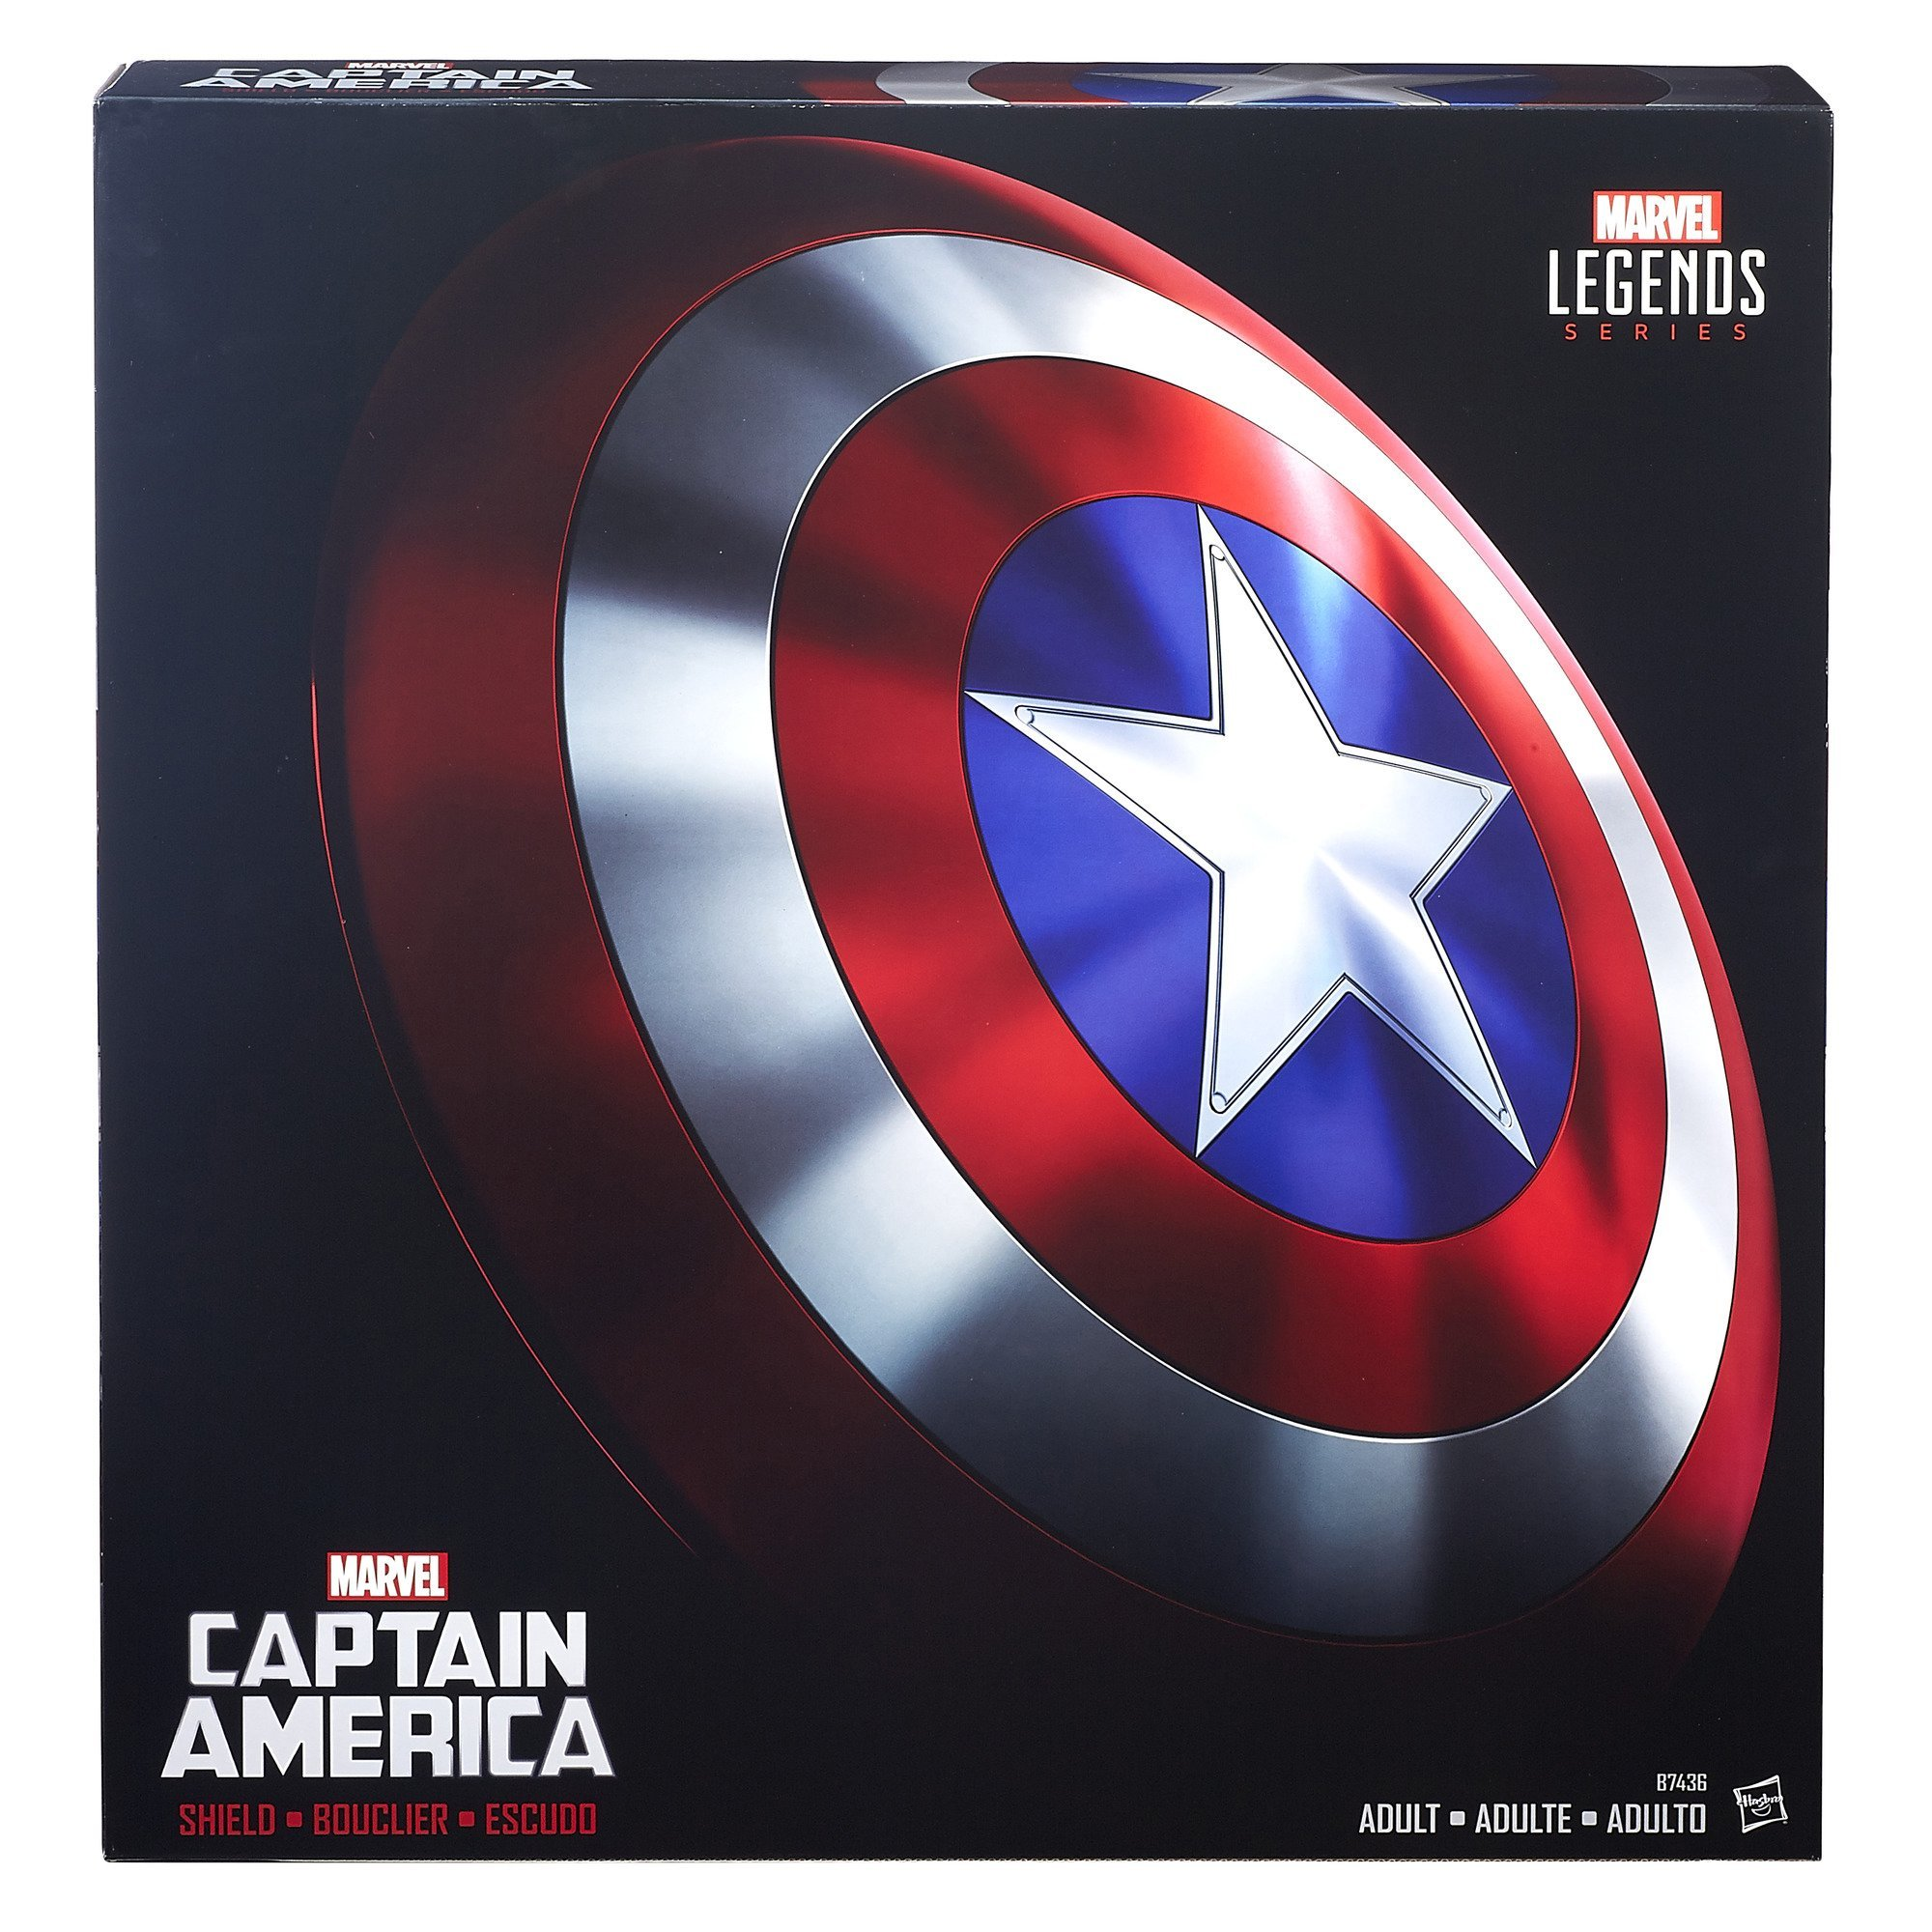 Marvel Legends Captain America Shield by Avengers (Image #2)